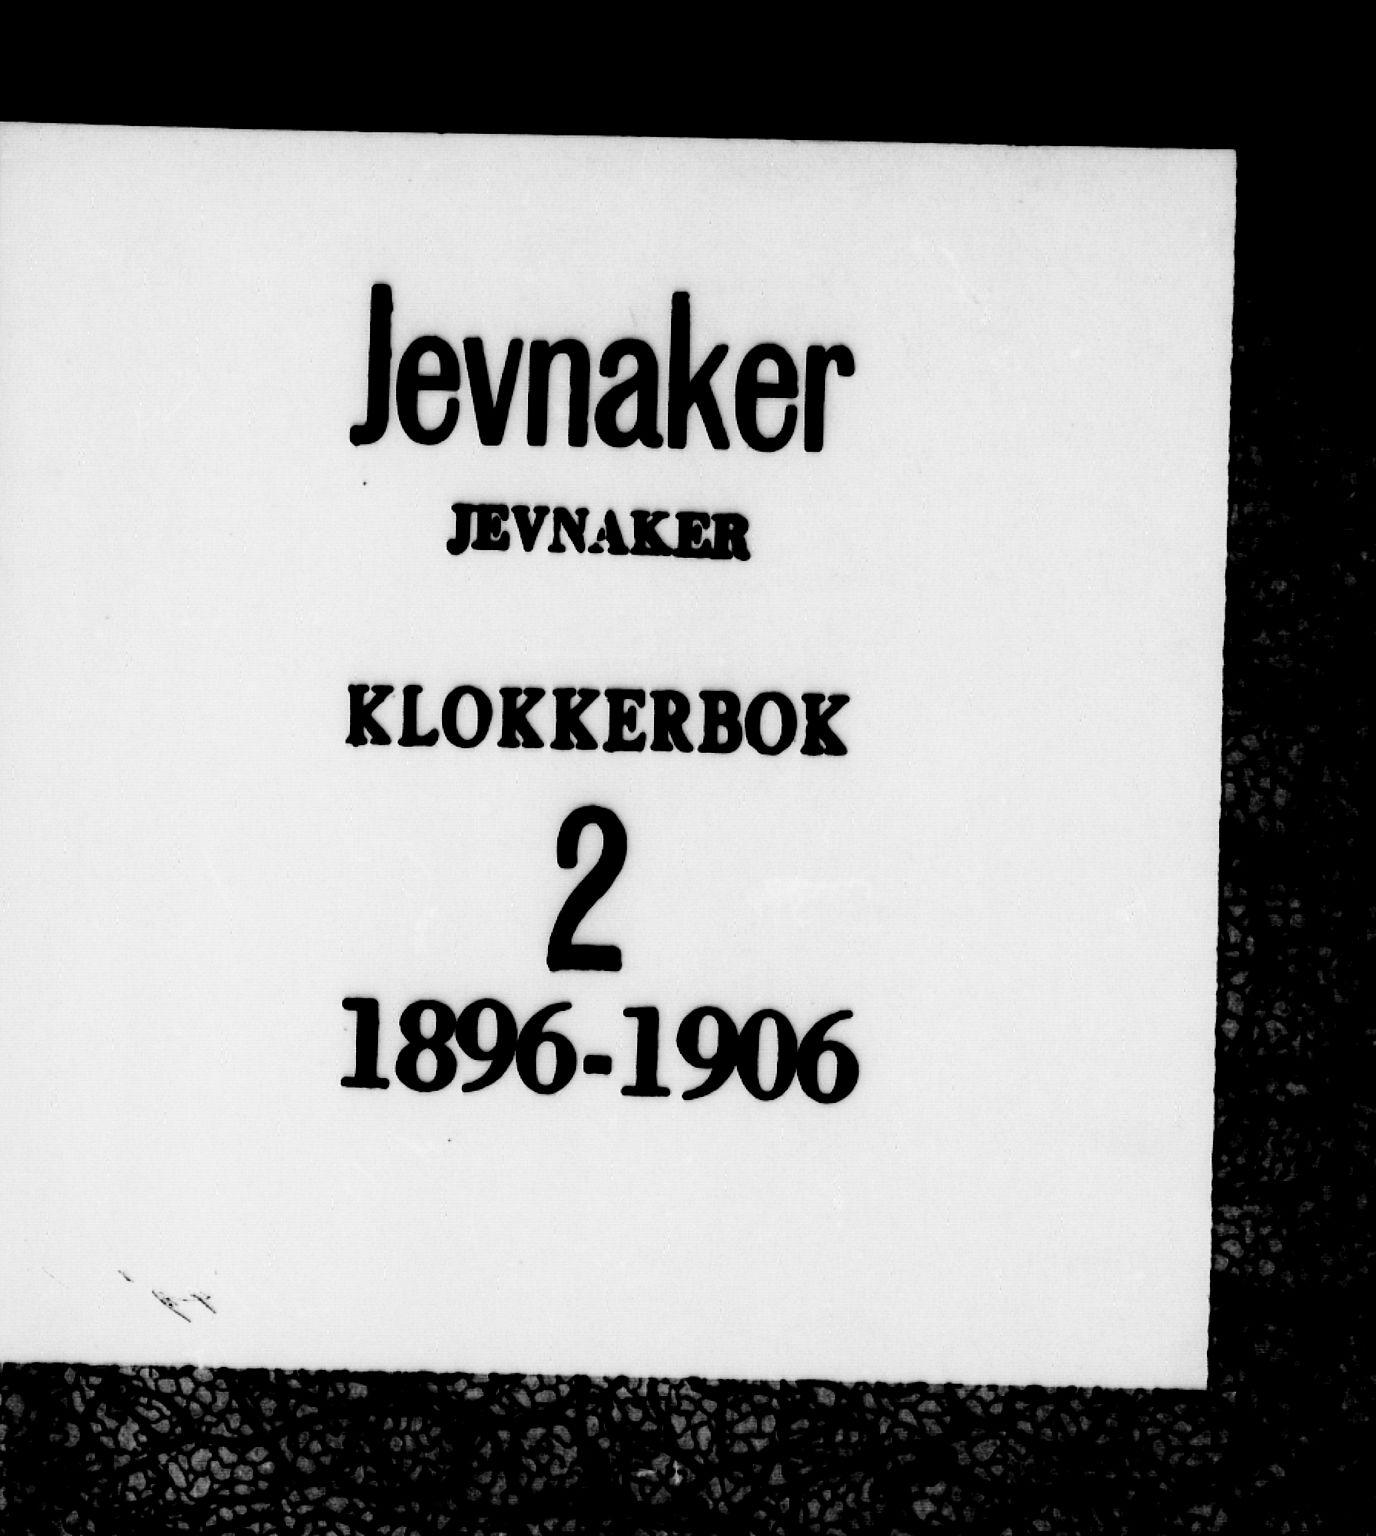 SAH, Jevnaker prestekontor, Klokkerbok nr. 2, 1896-1906